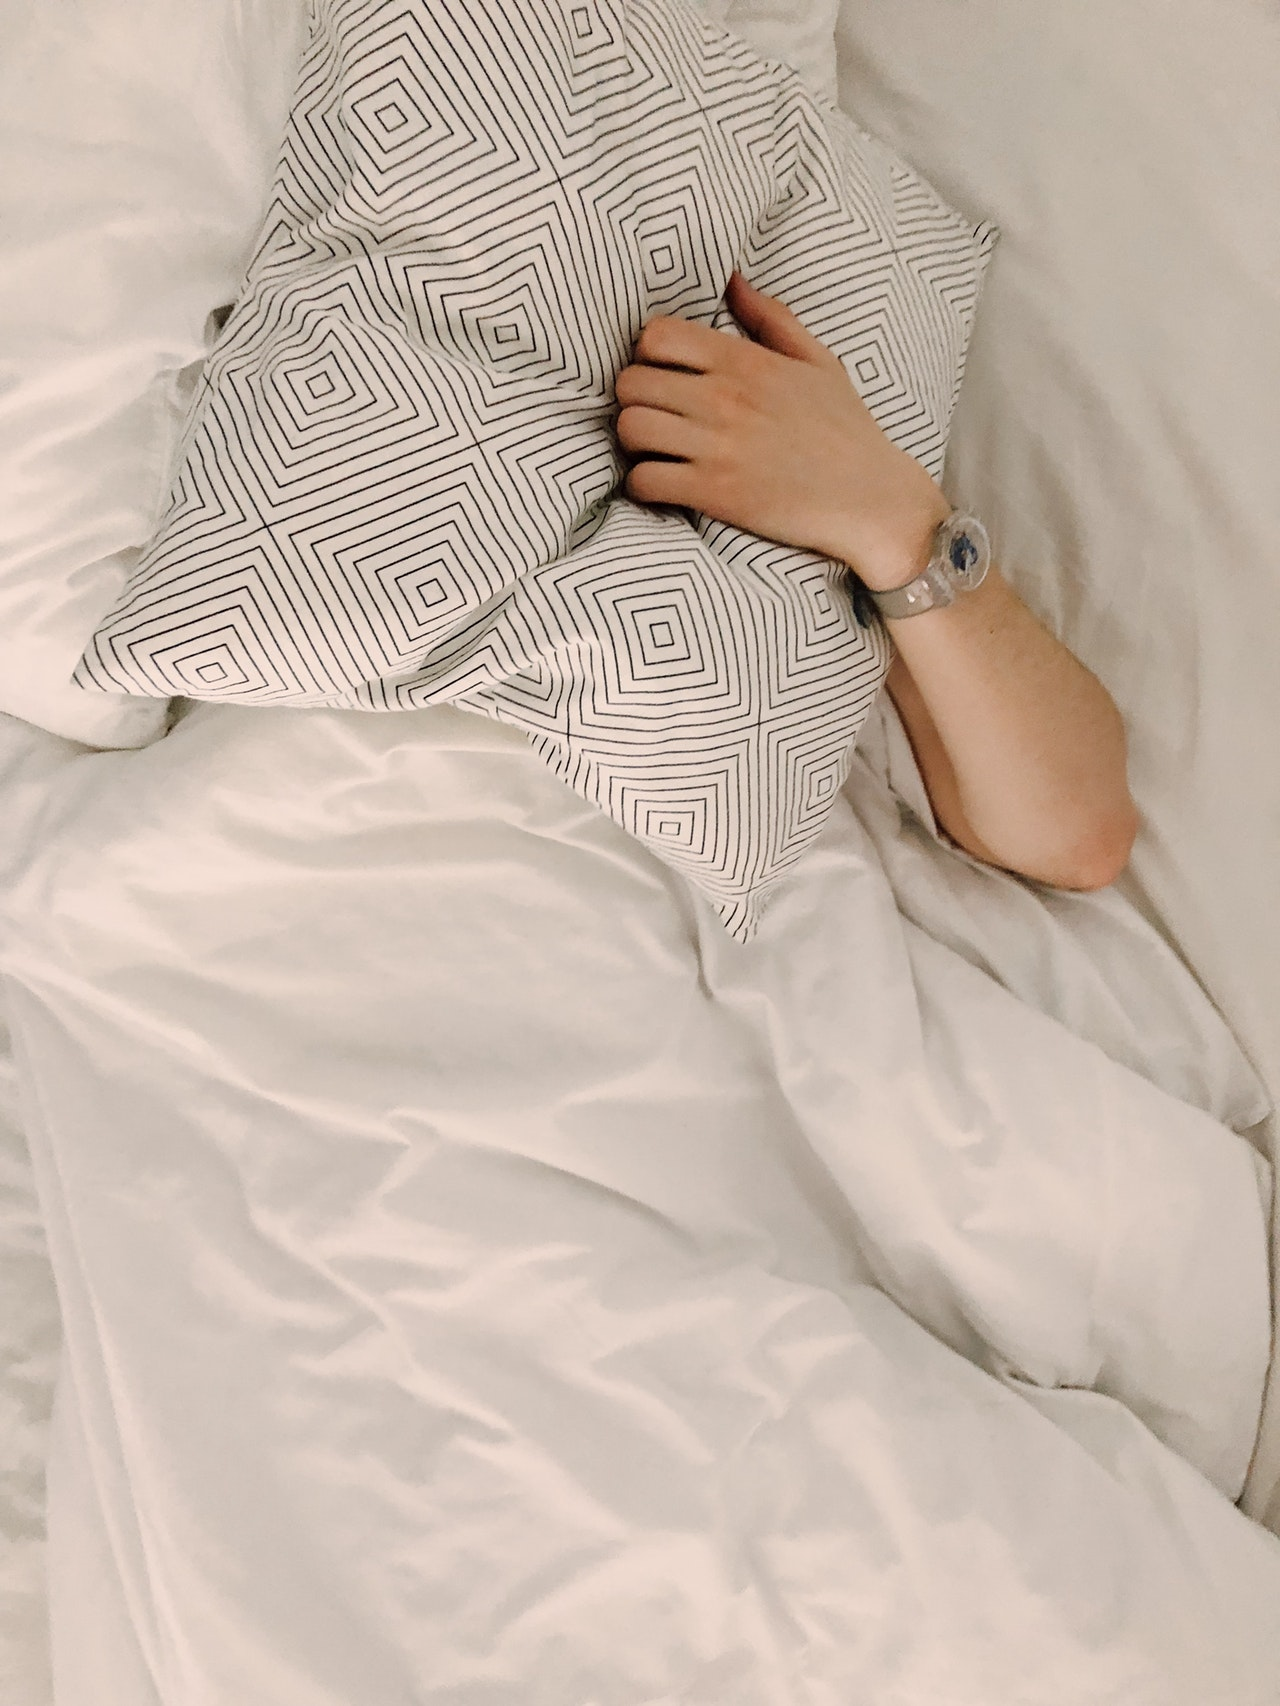 Unusual Fall Asleep Article Image